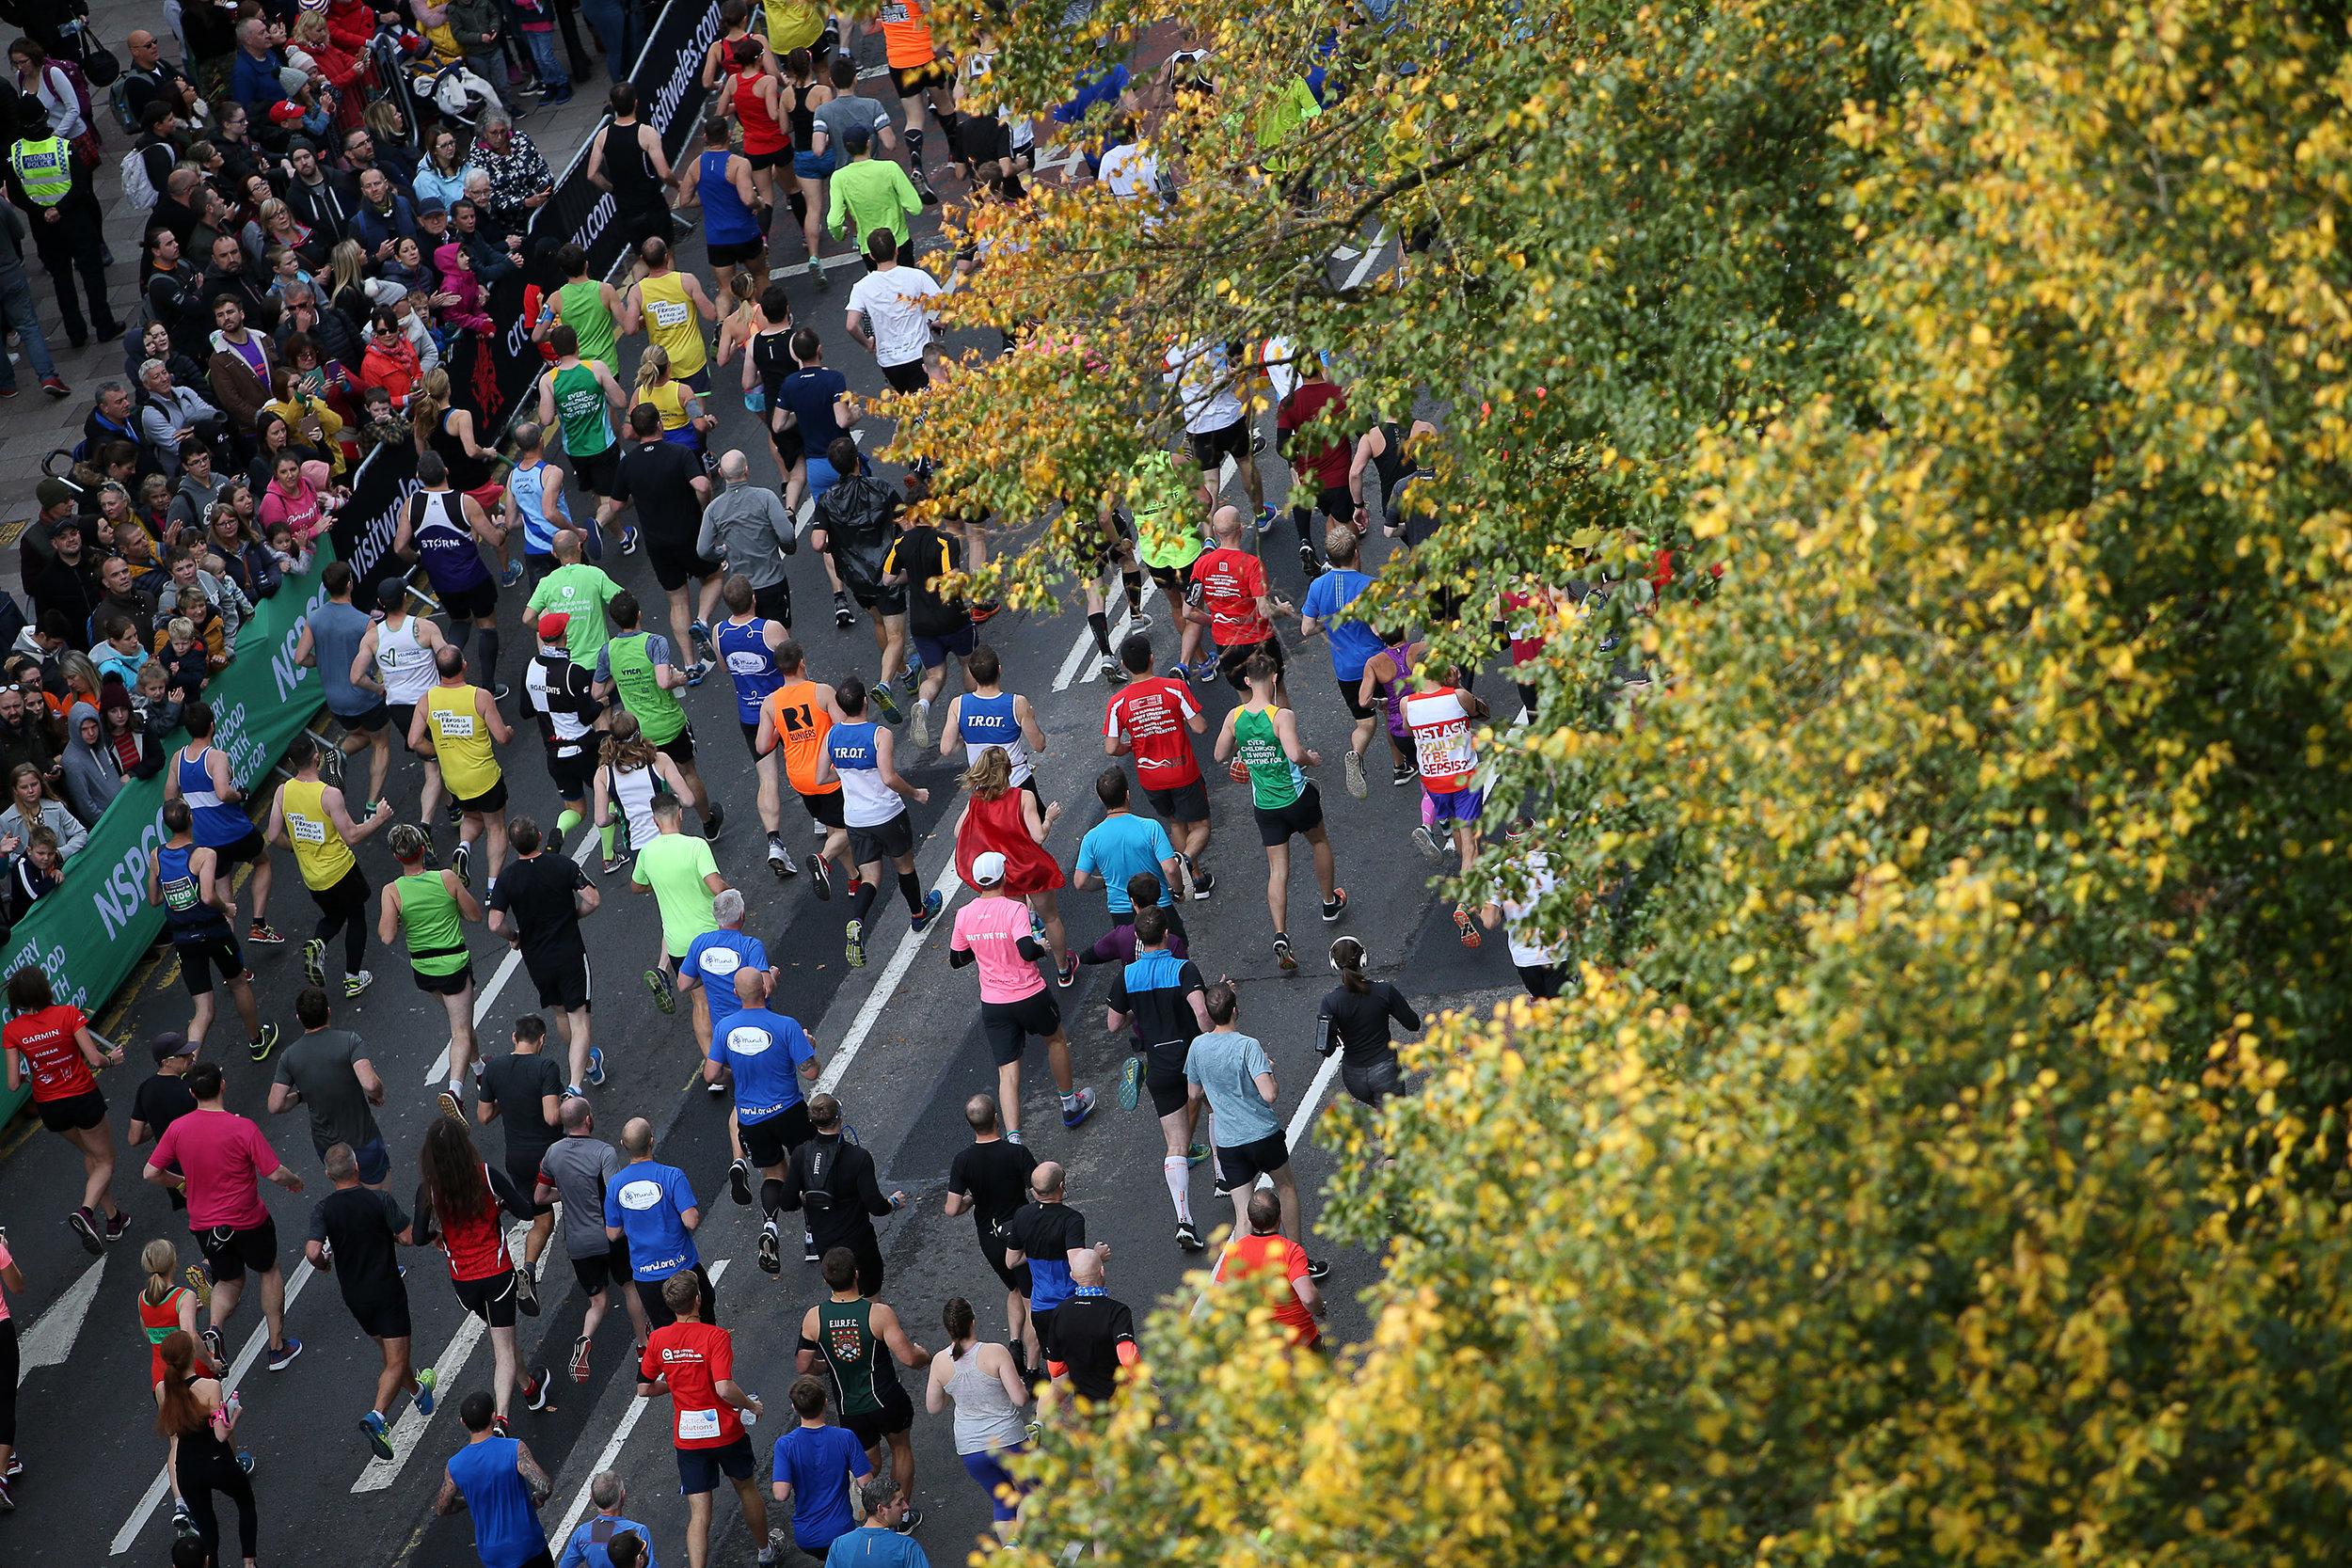 CDF_071018_CF_Cardiff_Half_Marathon_068.JPG